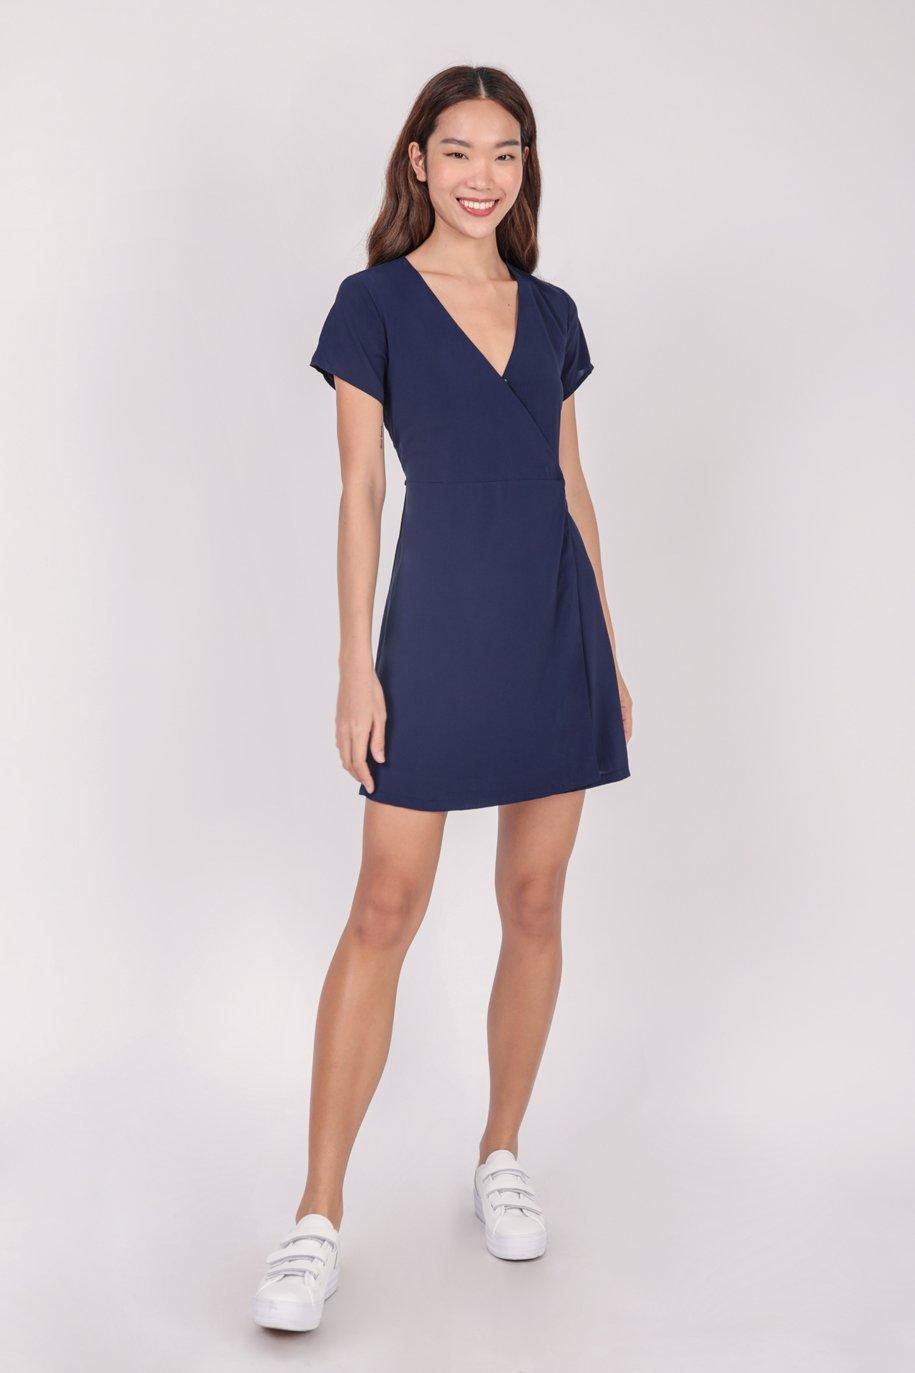 Remy Sleeved Dress (Navy)